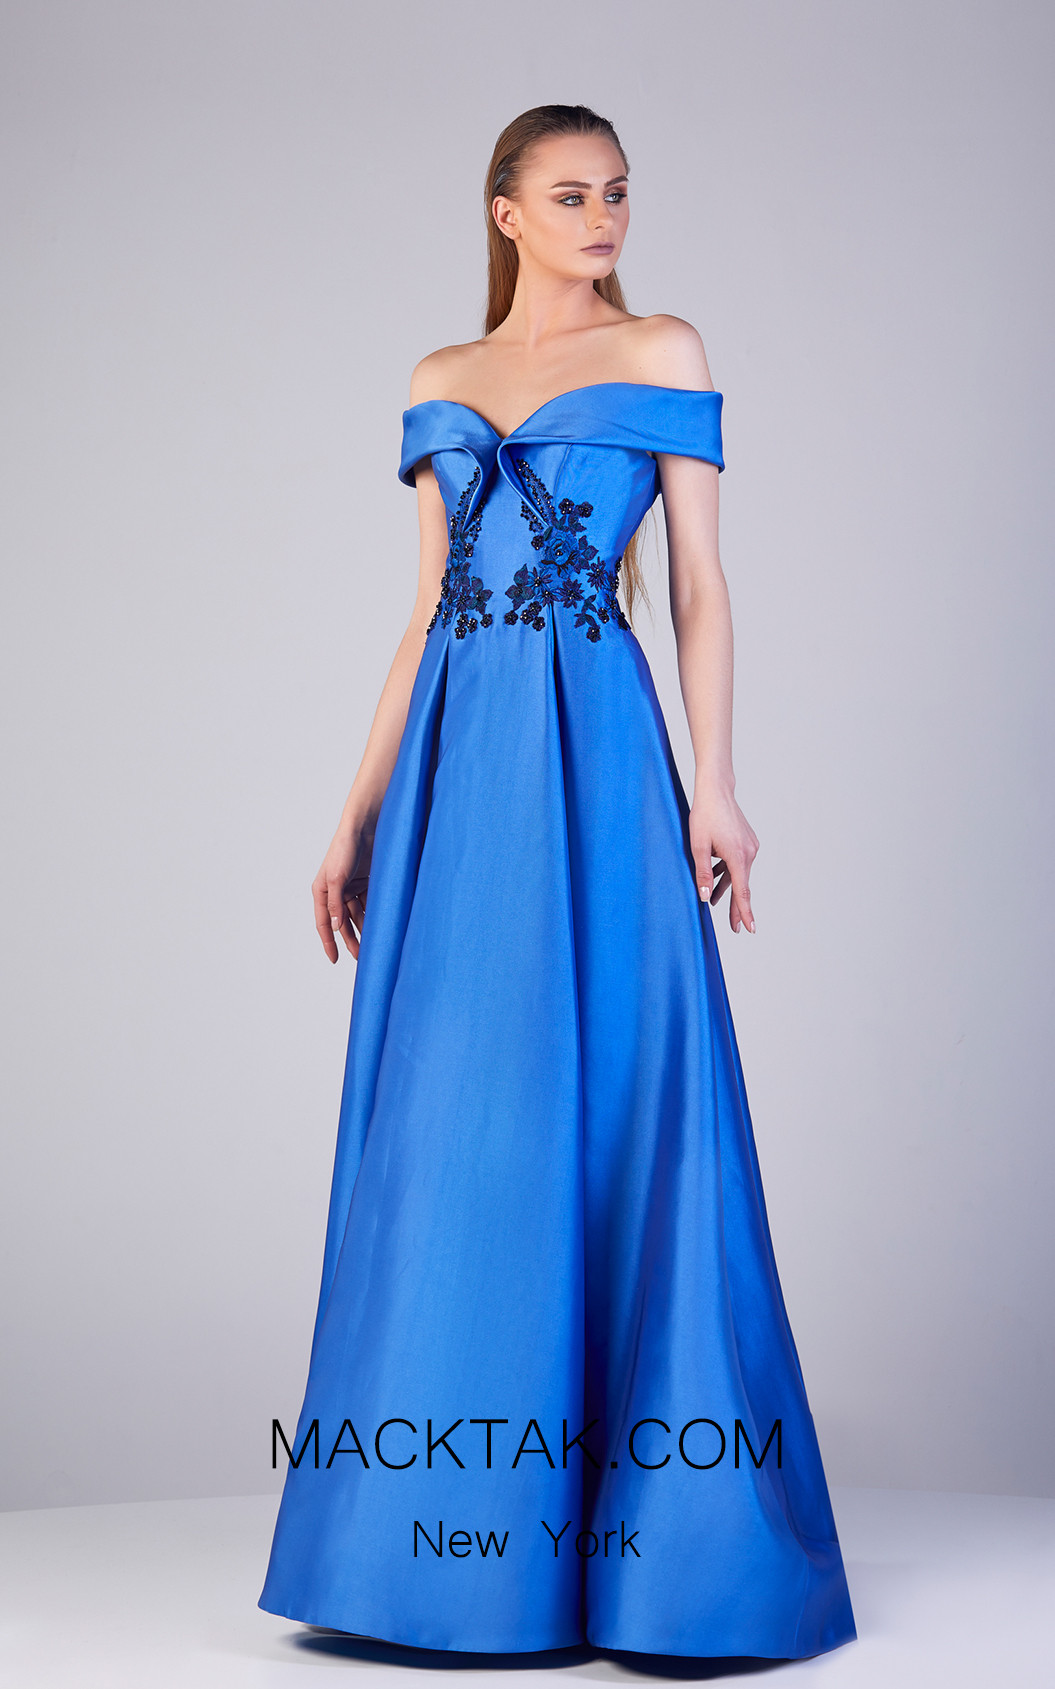 Gatti Nolli OP5179 Peony Front Dress